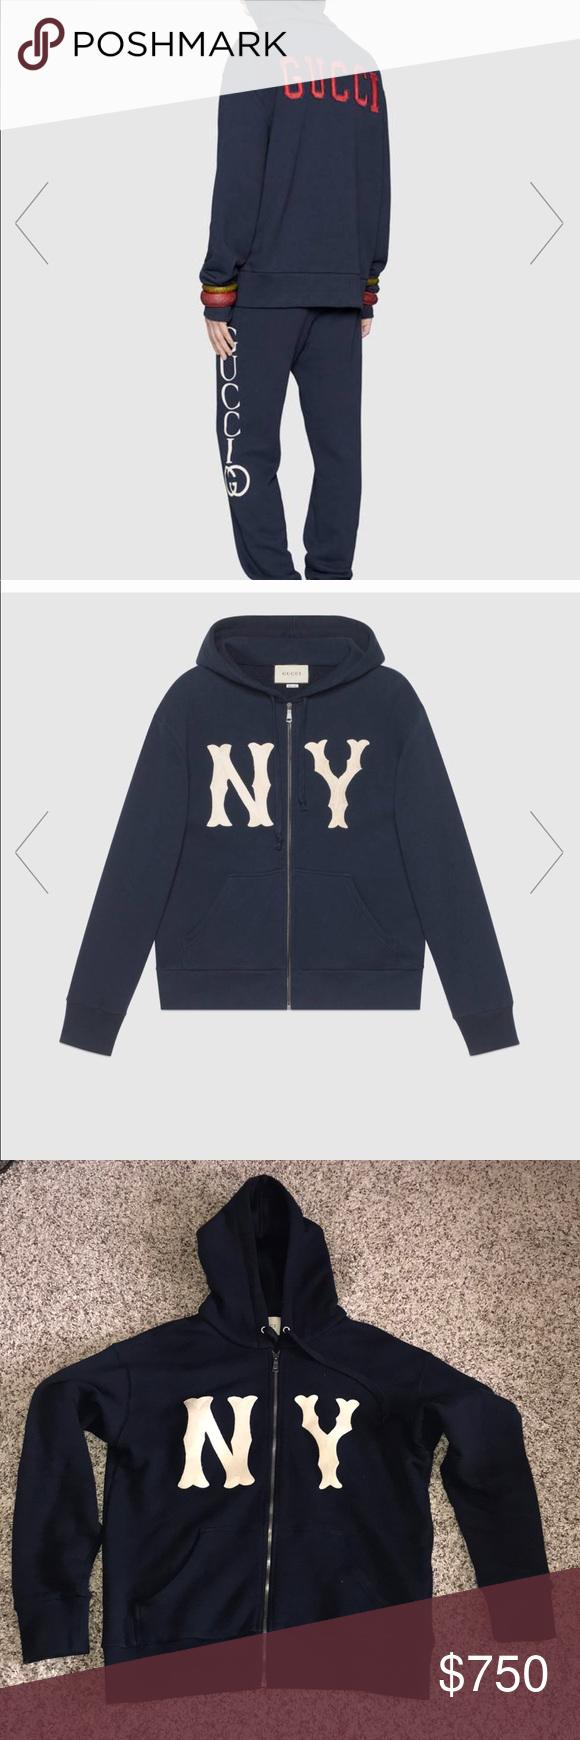 Gucci Men S Sweatshirt With Ny Yankees Patch Gucci Men S Sweatshirt With Ny Yankees Patch Size Medium In Good Preo Mens Sweatshirts Sweatshirts Gucci Men [ 1740 x 580 Pixel ]